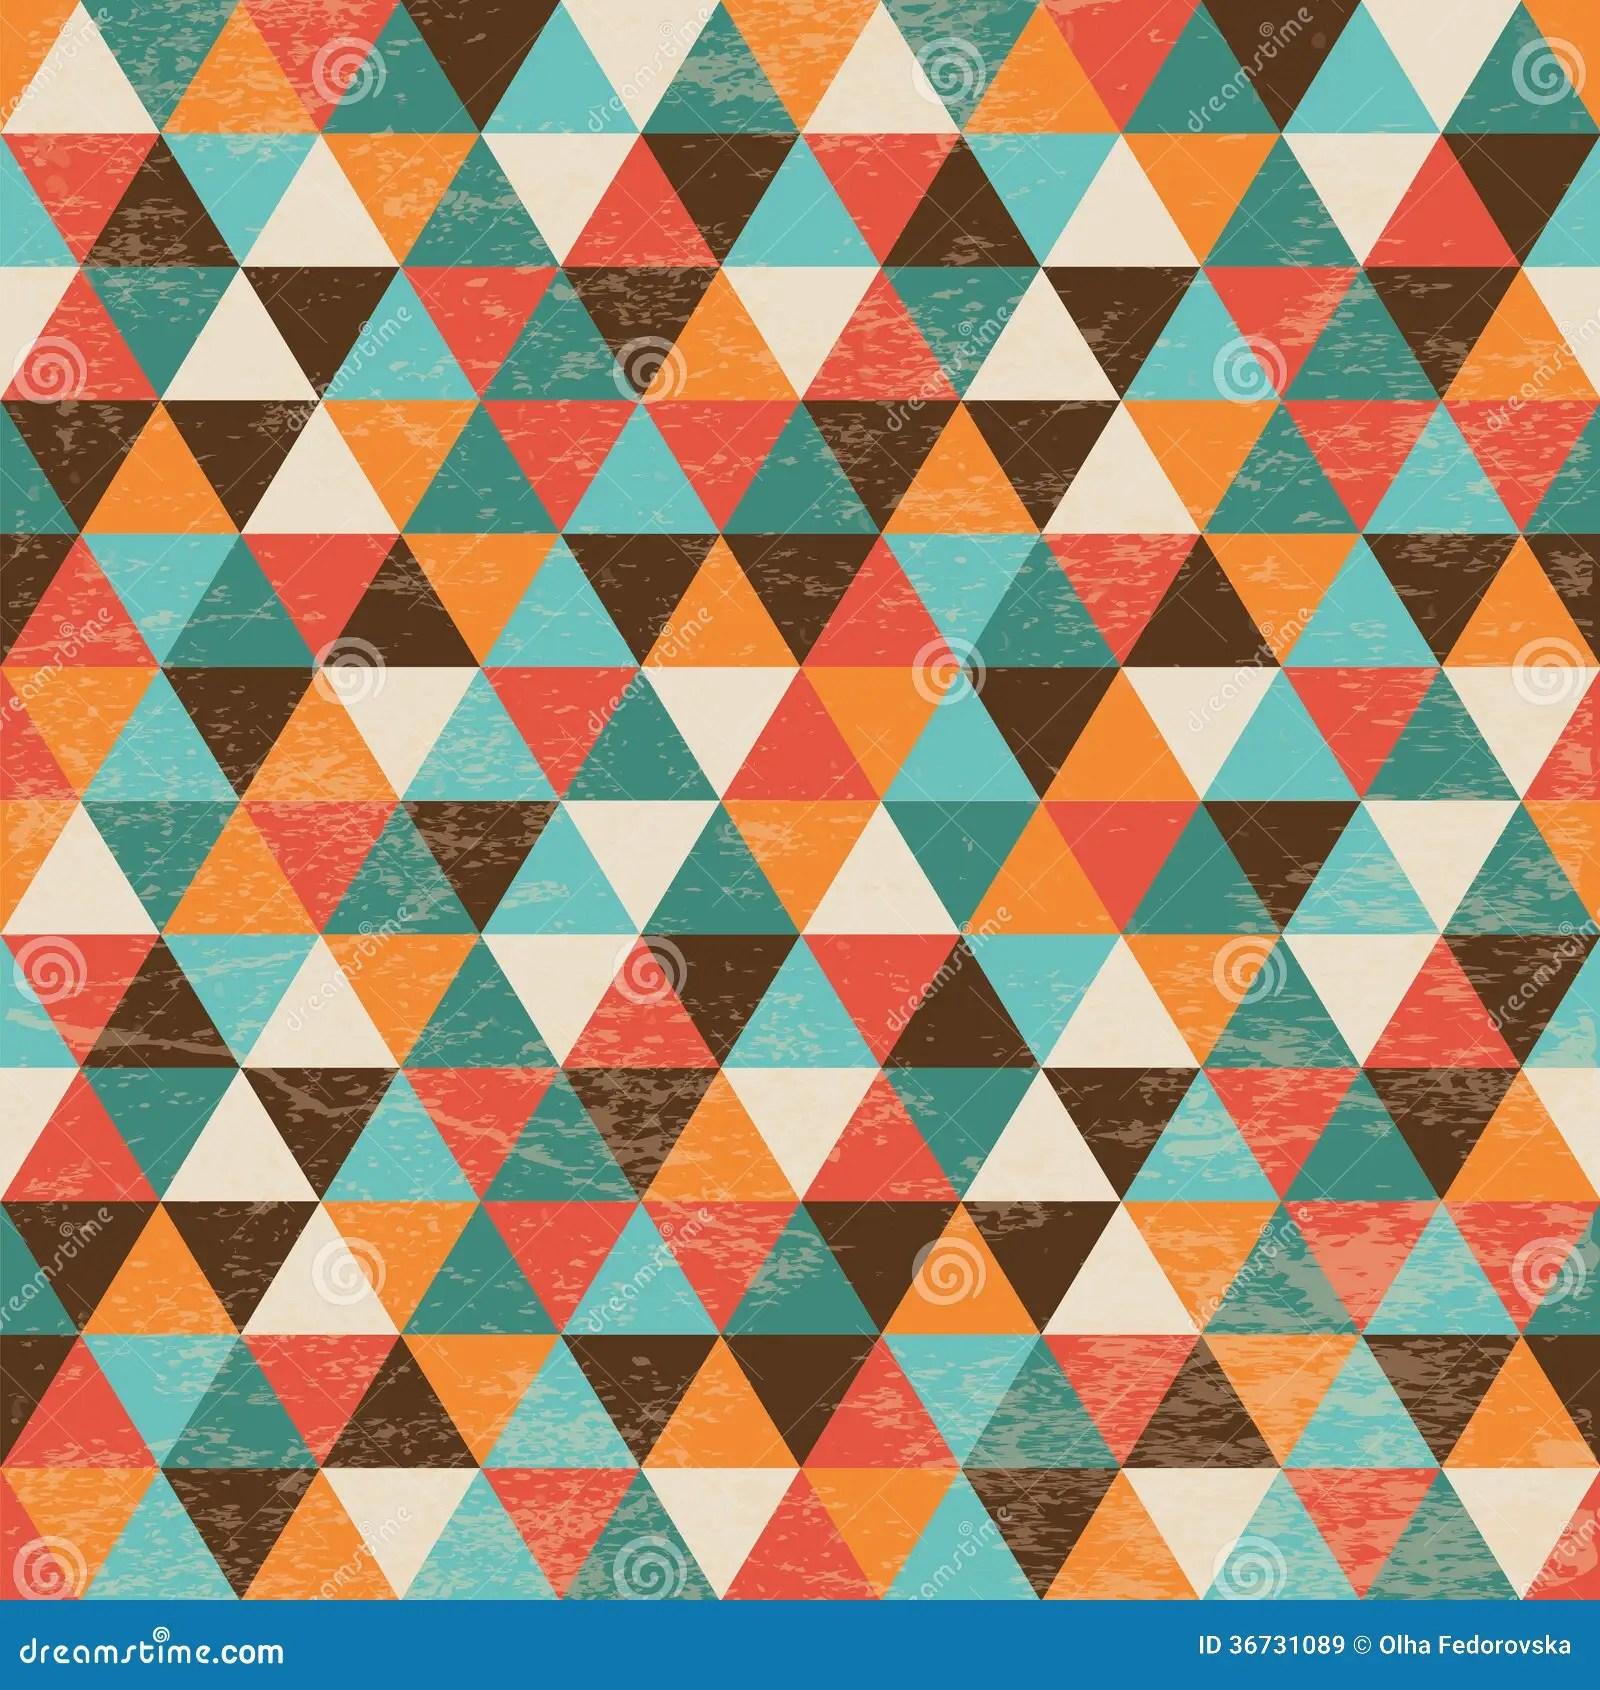 Mondrian Iphone Wallpaper Seamless Geometric Triangle Background Stock Vector